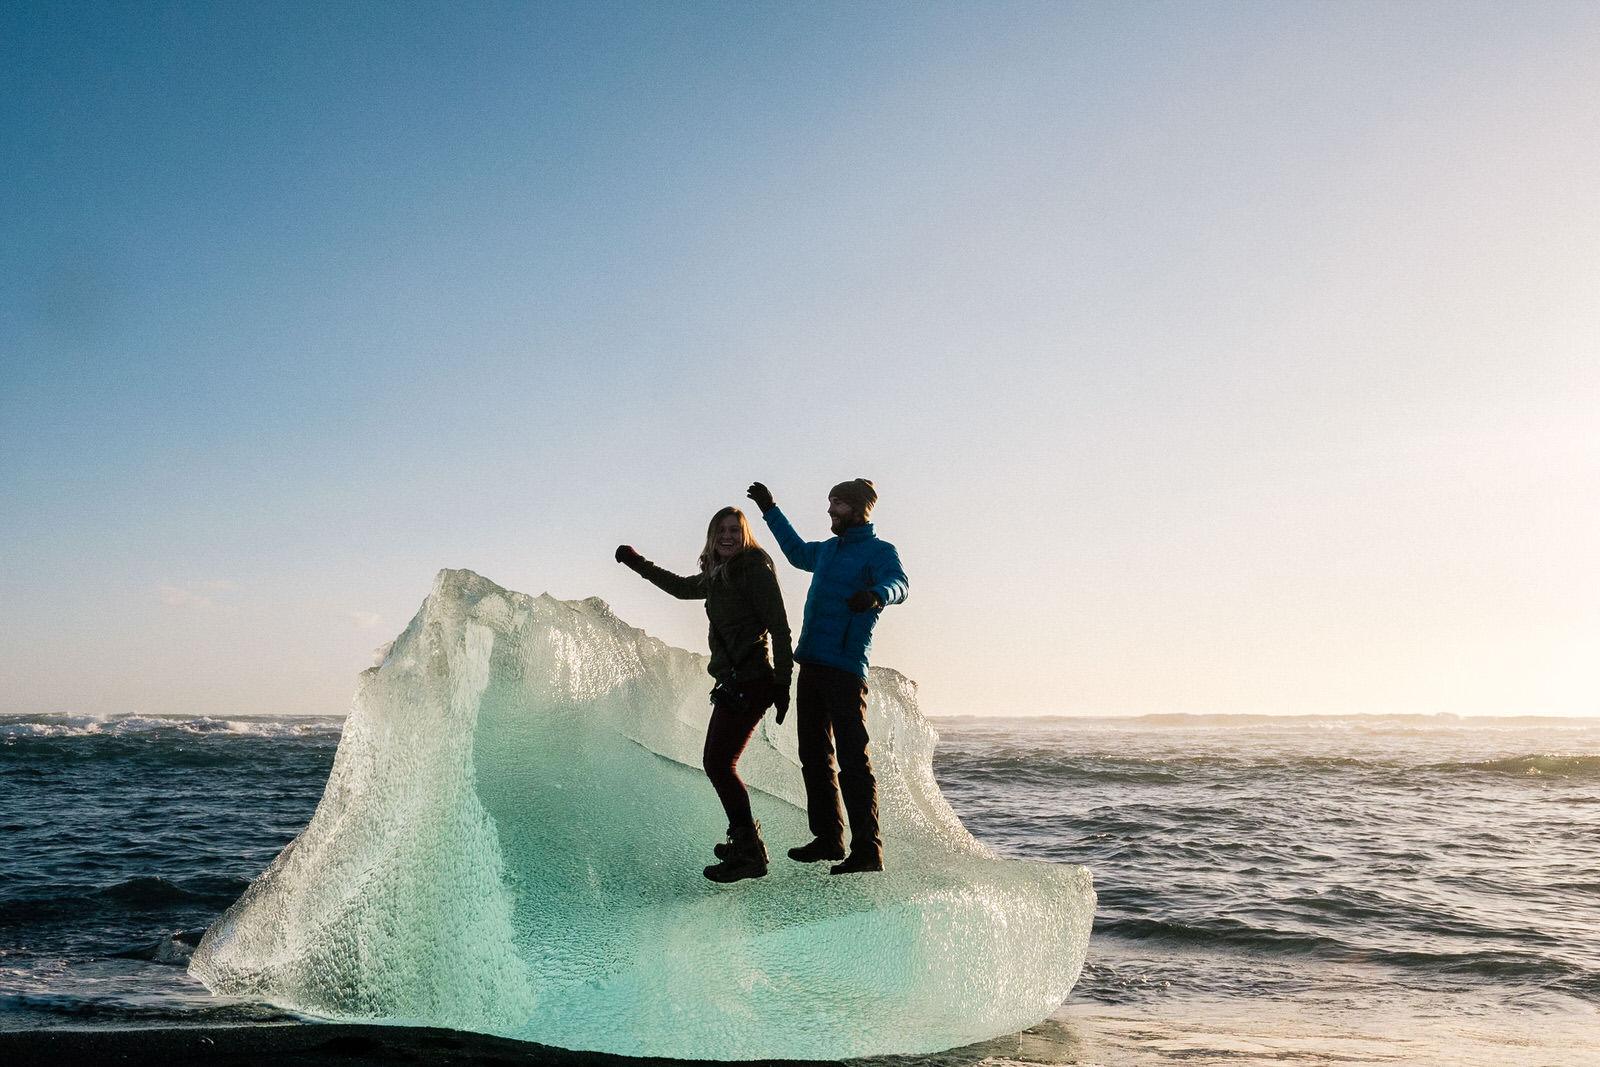 Collective_Wander_Iceland_Photographers_Trip_074.jpg